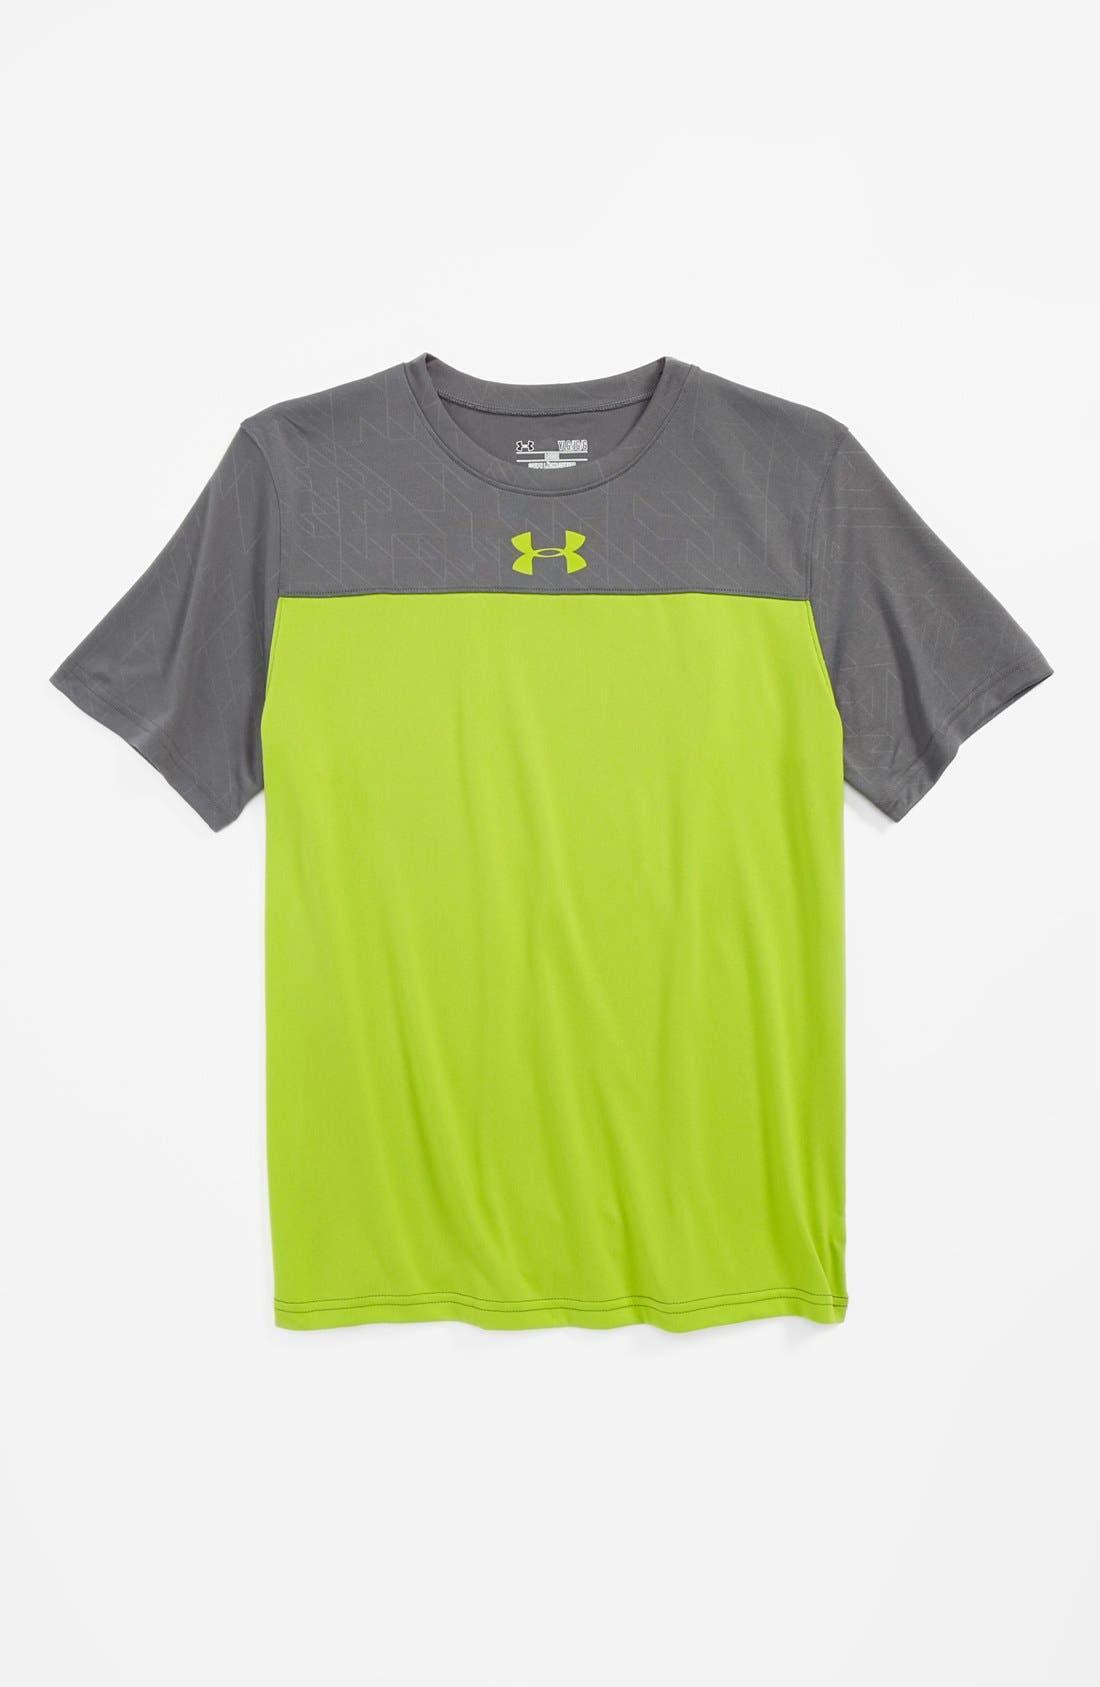 Alternate Image 1 Selected - Under Armour 'Brouhaha' HeatGear® T-Shirt (Big Boys)